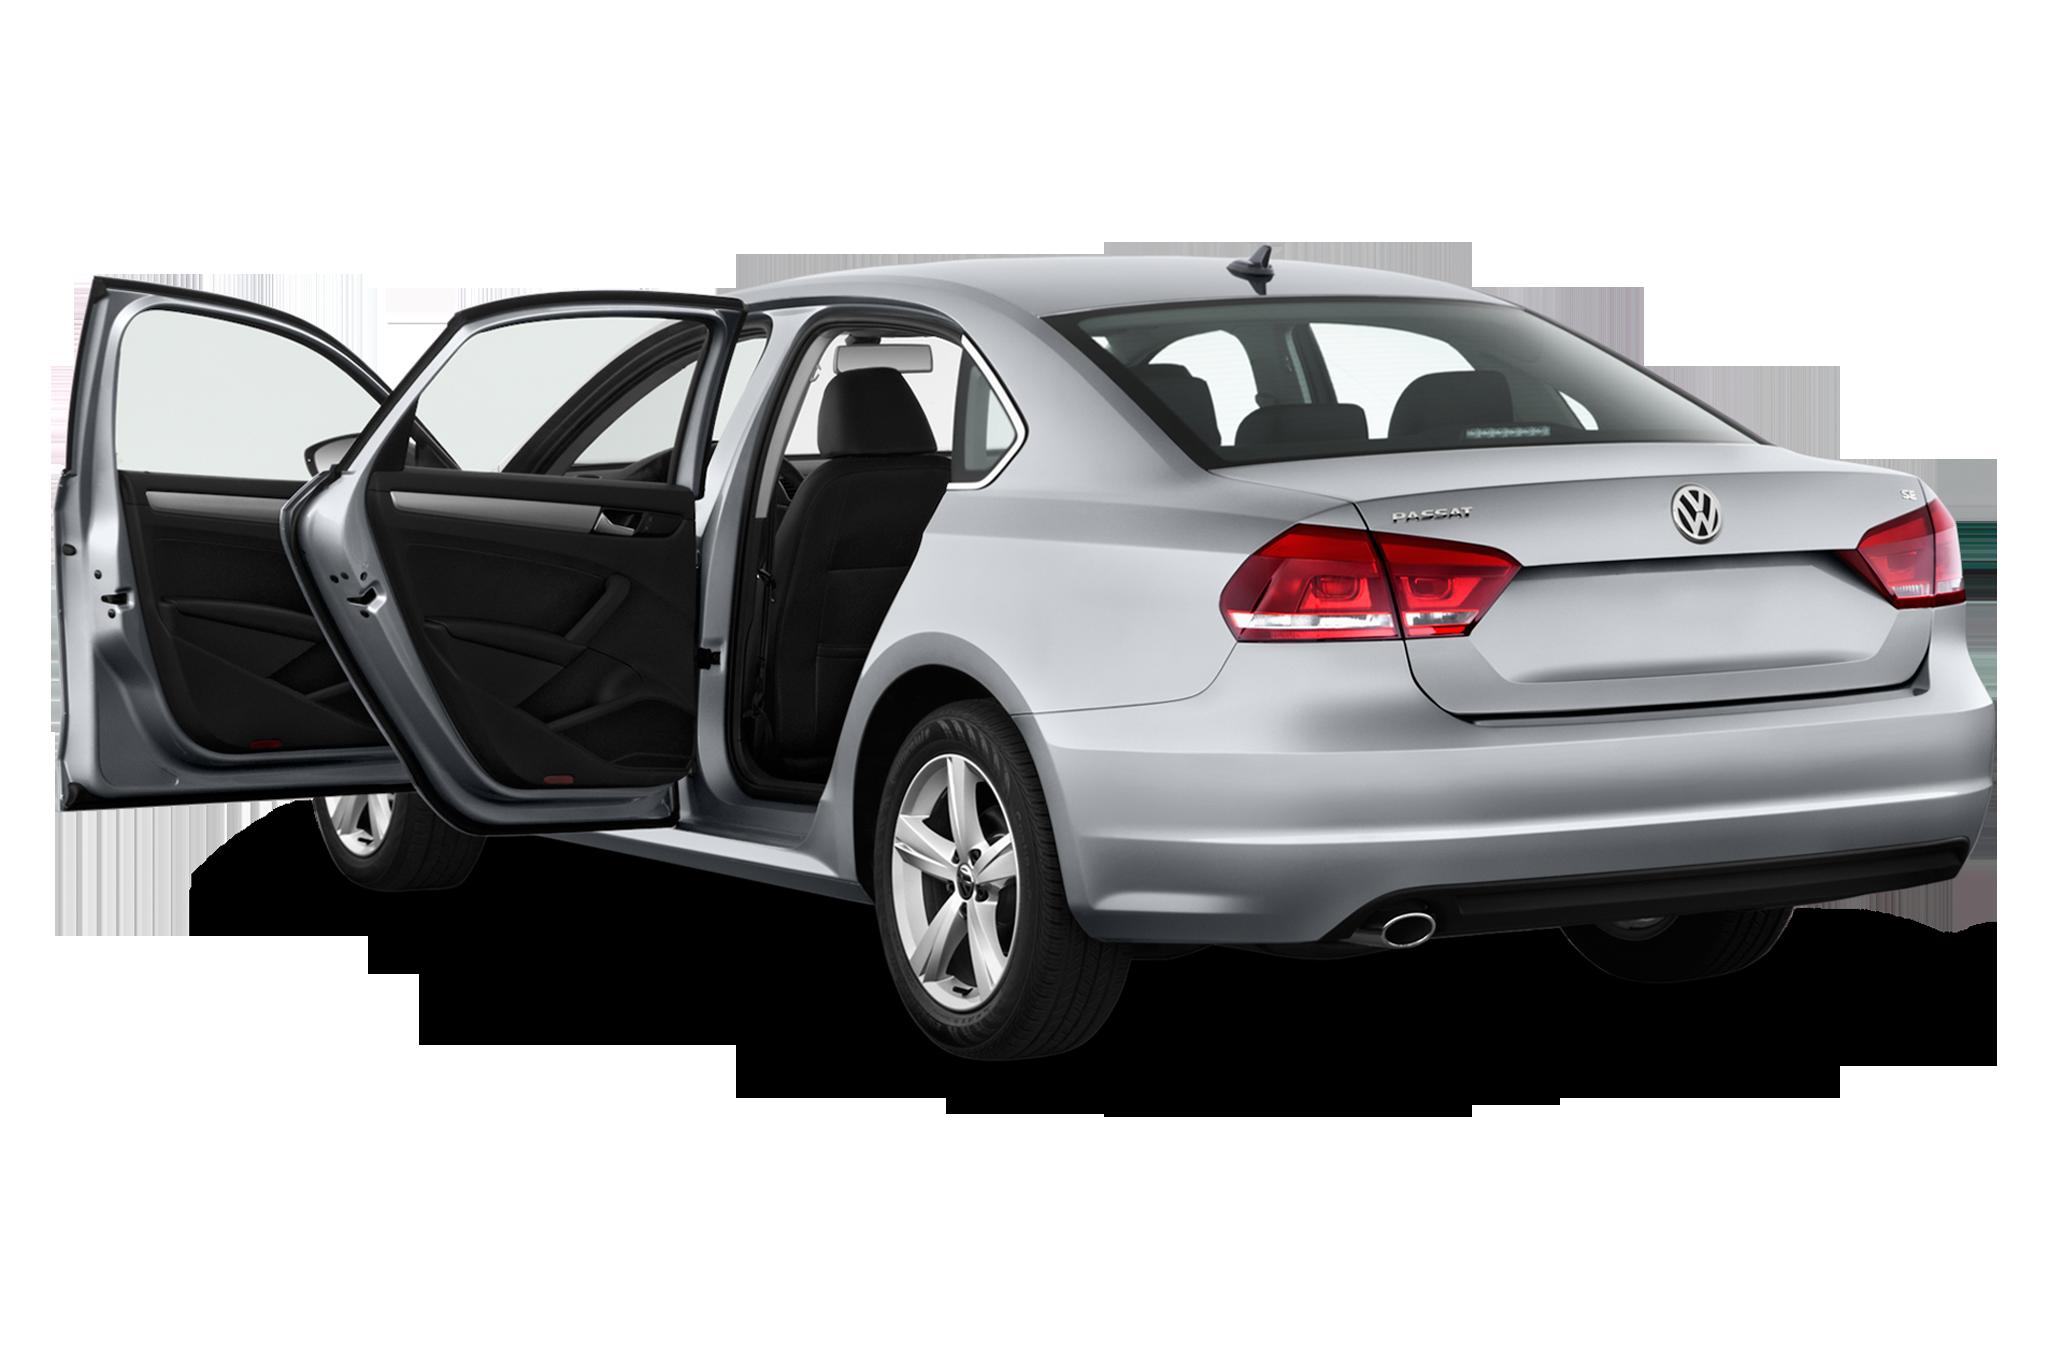 2012 volkswagen passat se editors 39 notebook automobile. Black Bedroom Furniture Sets. Home Design Ideas